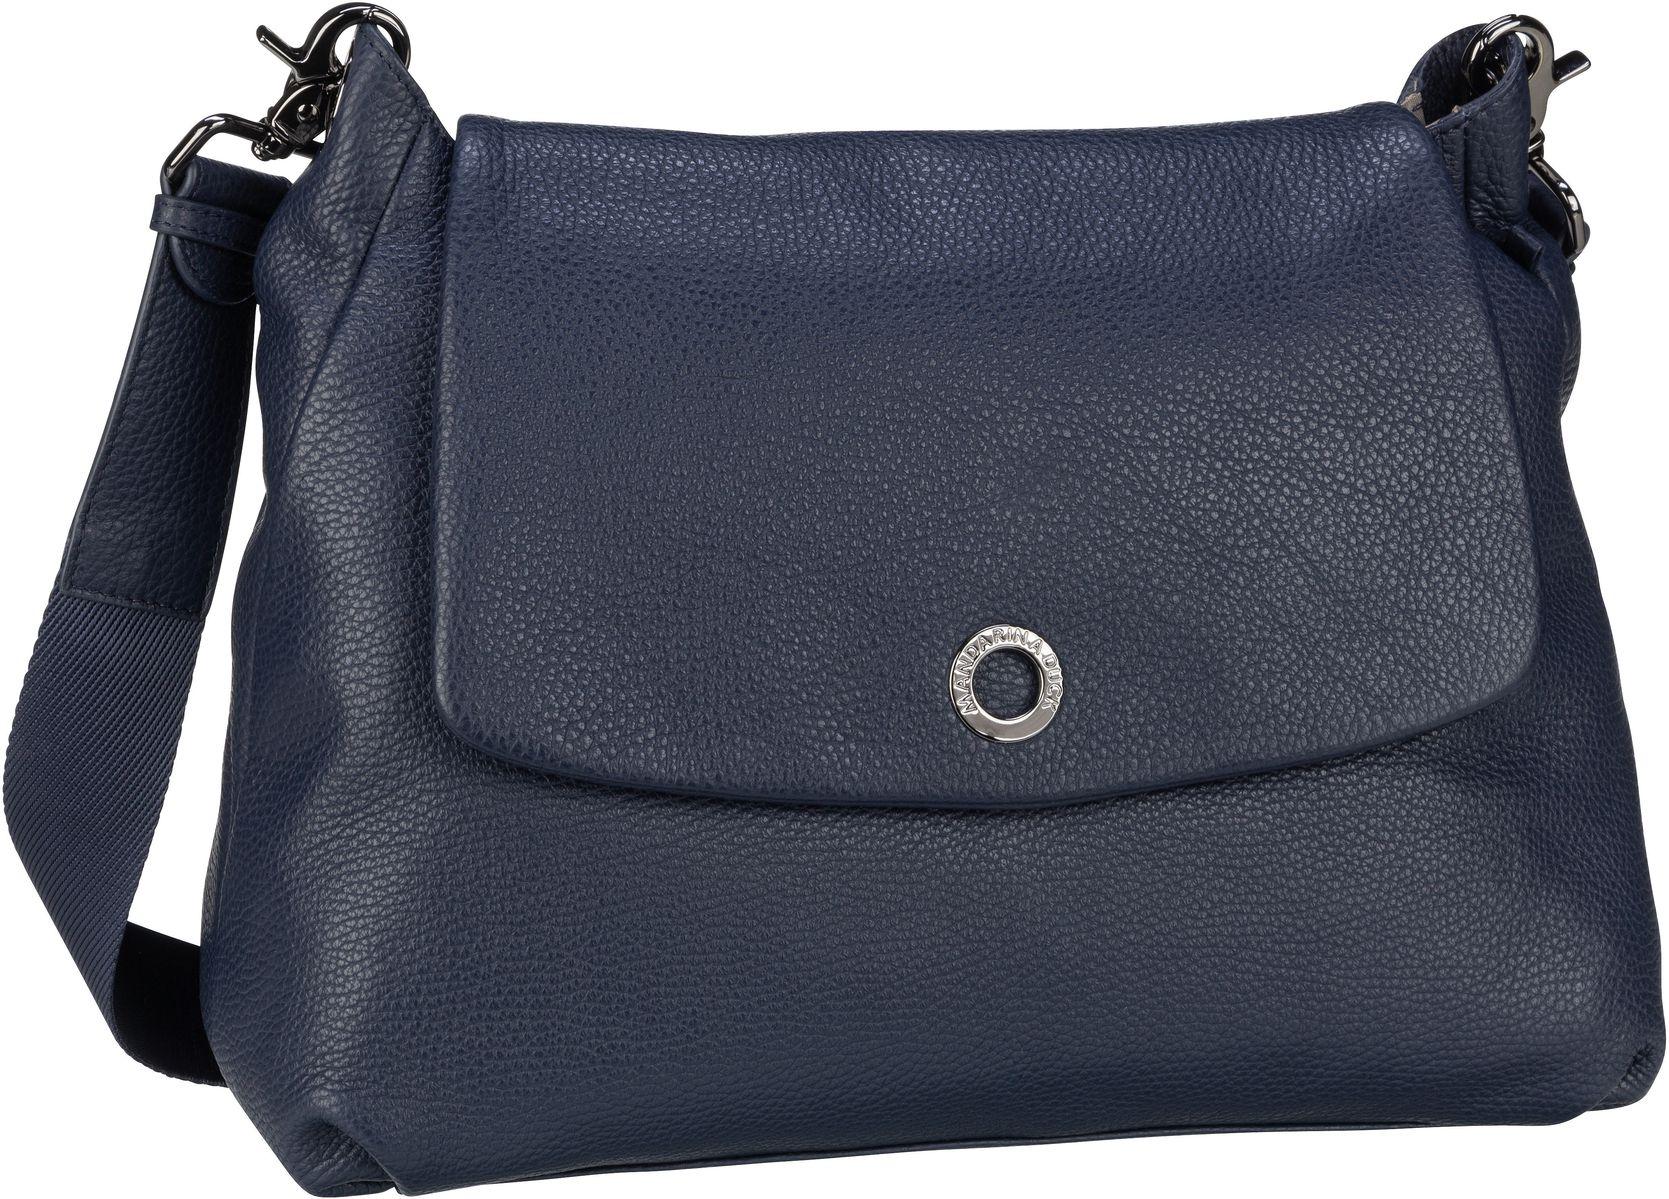 Umhängetasche Mellow Leather Shoulder Bag FZT30 Dress Blue